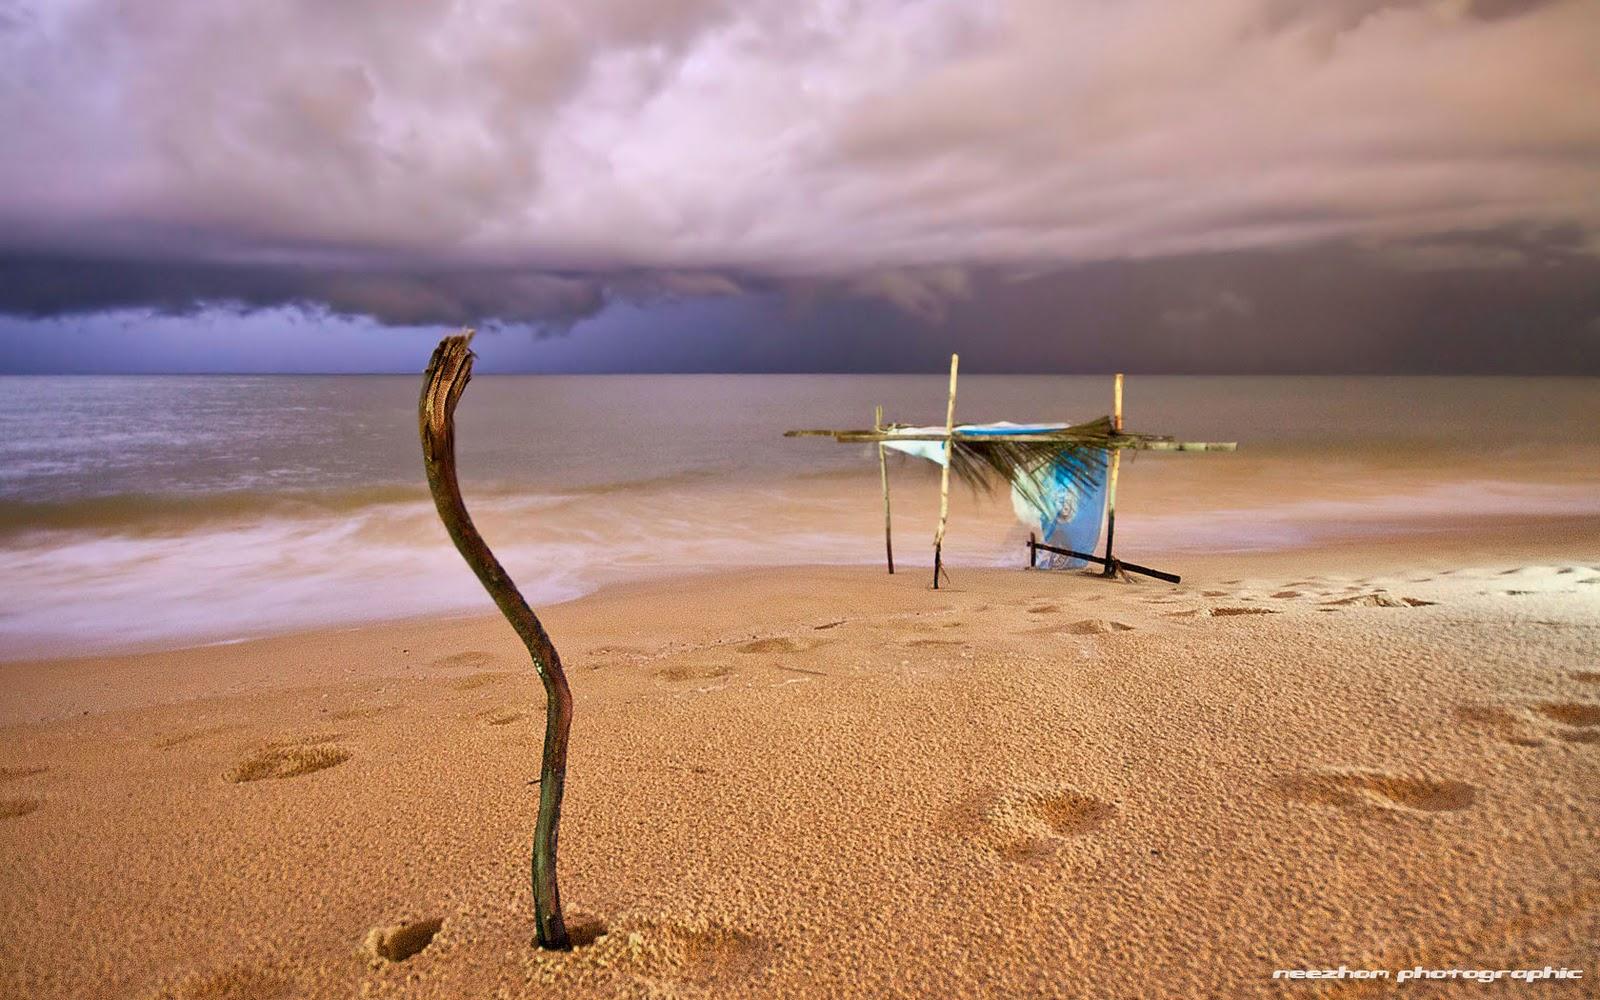 Pantai Telipot Kuala Terengganu Terengganu Unikversiti